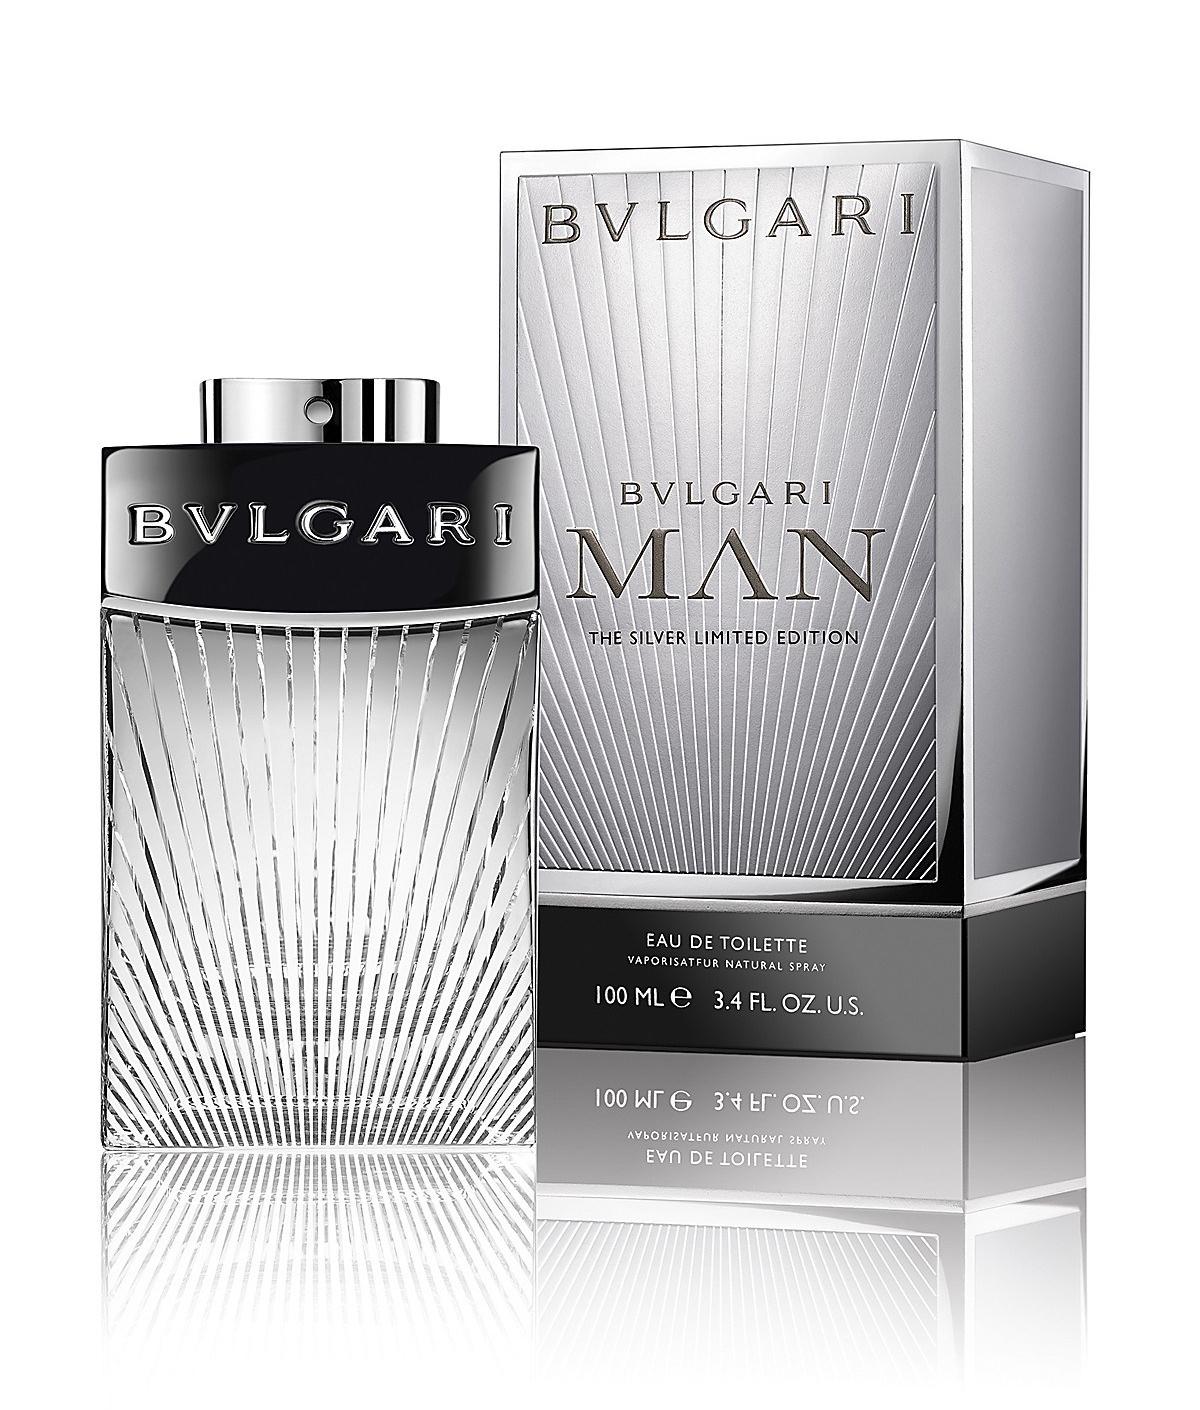 Bvlgari Man The Silver Limited Edition Flacon Box